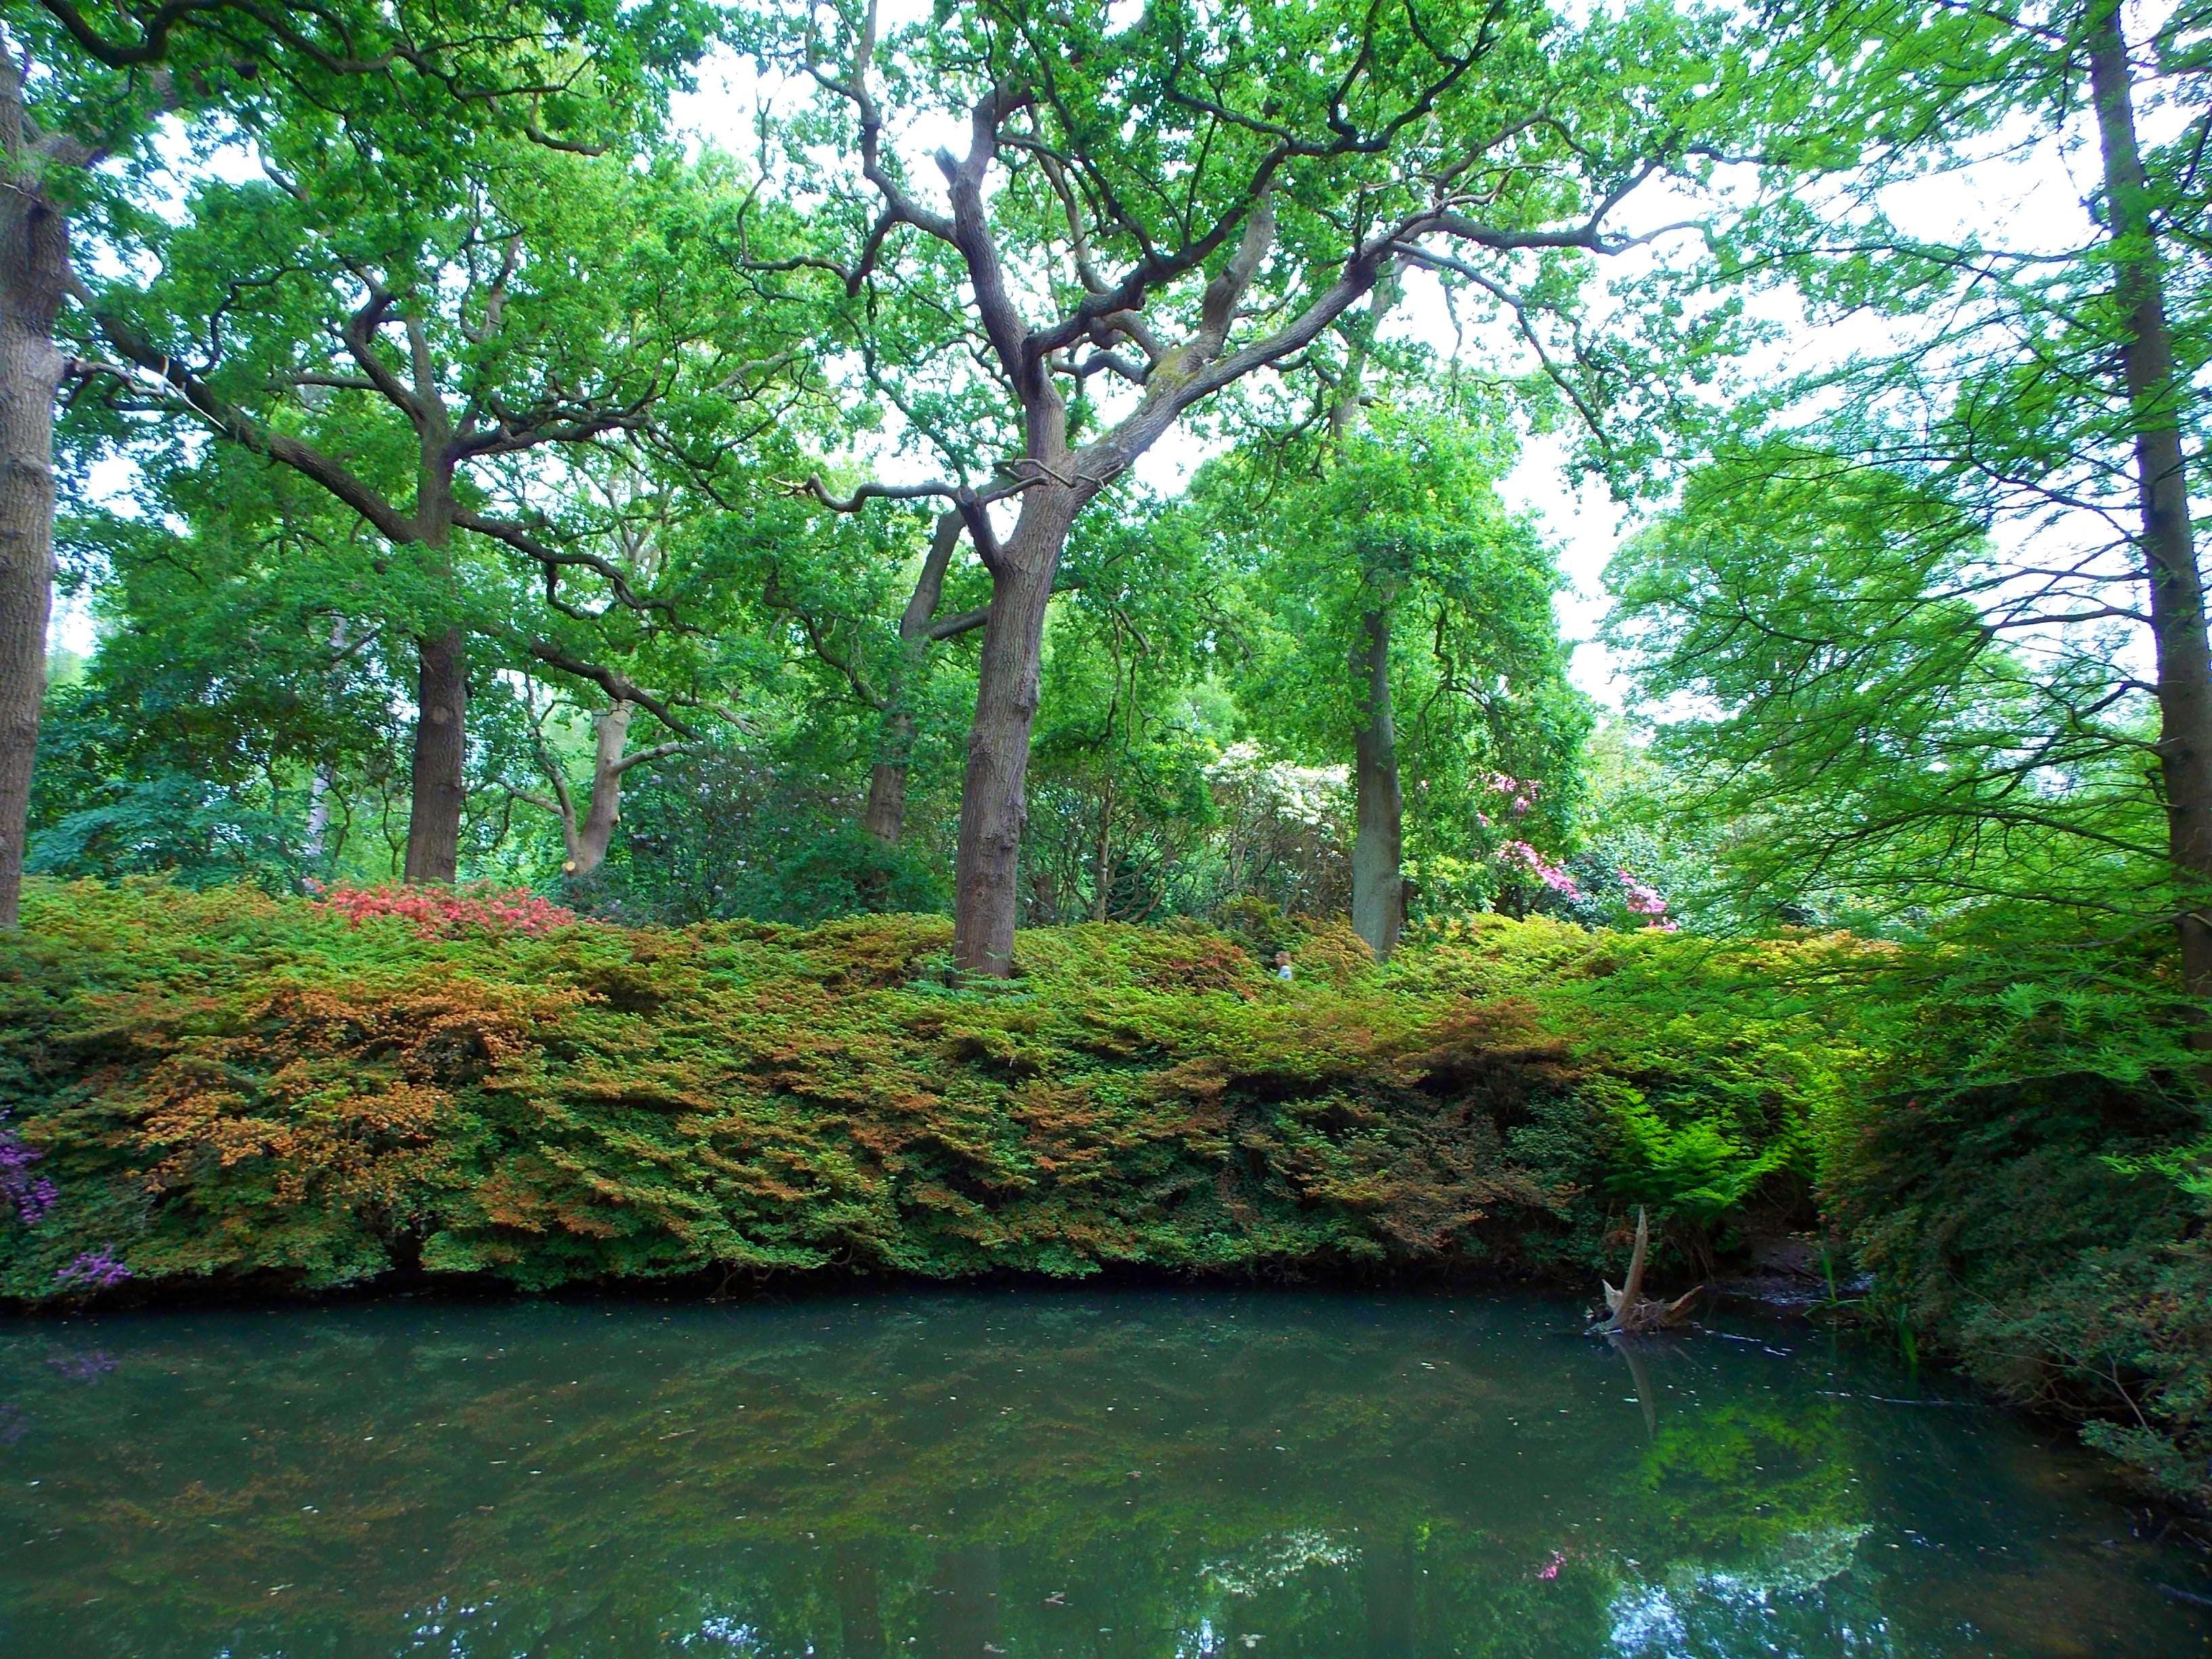 countryside, daylight, environment